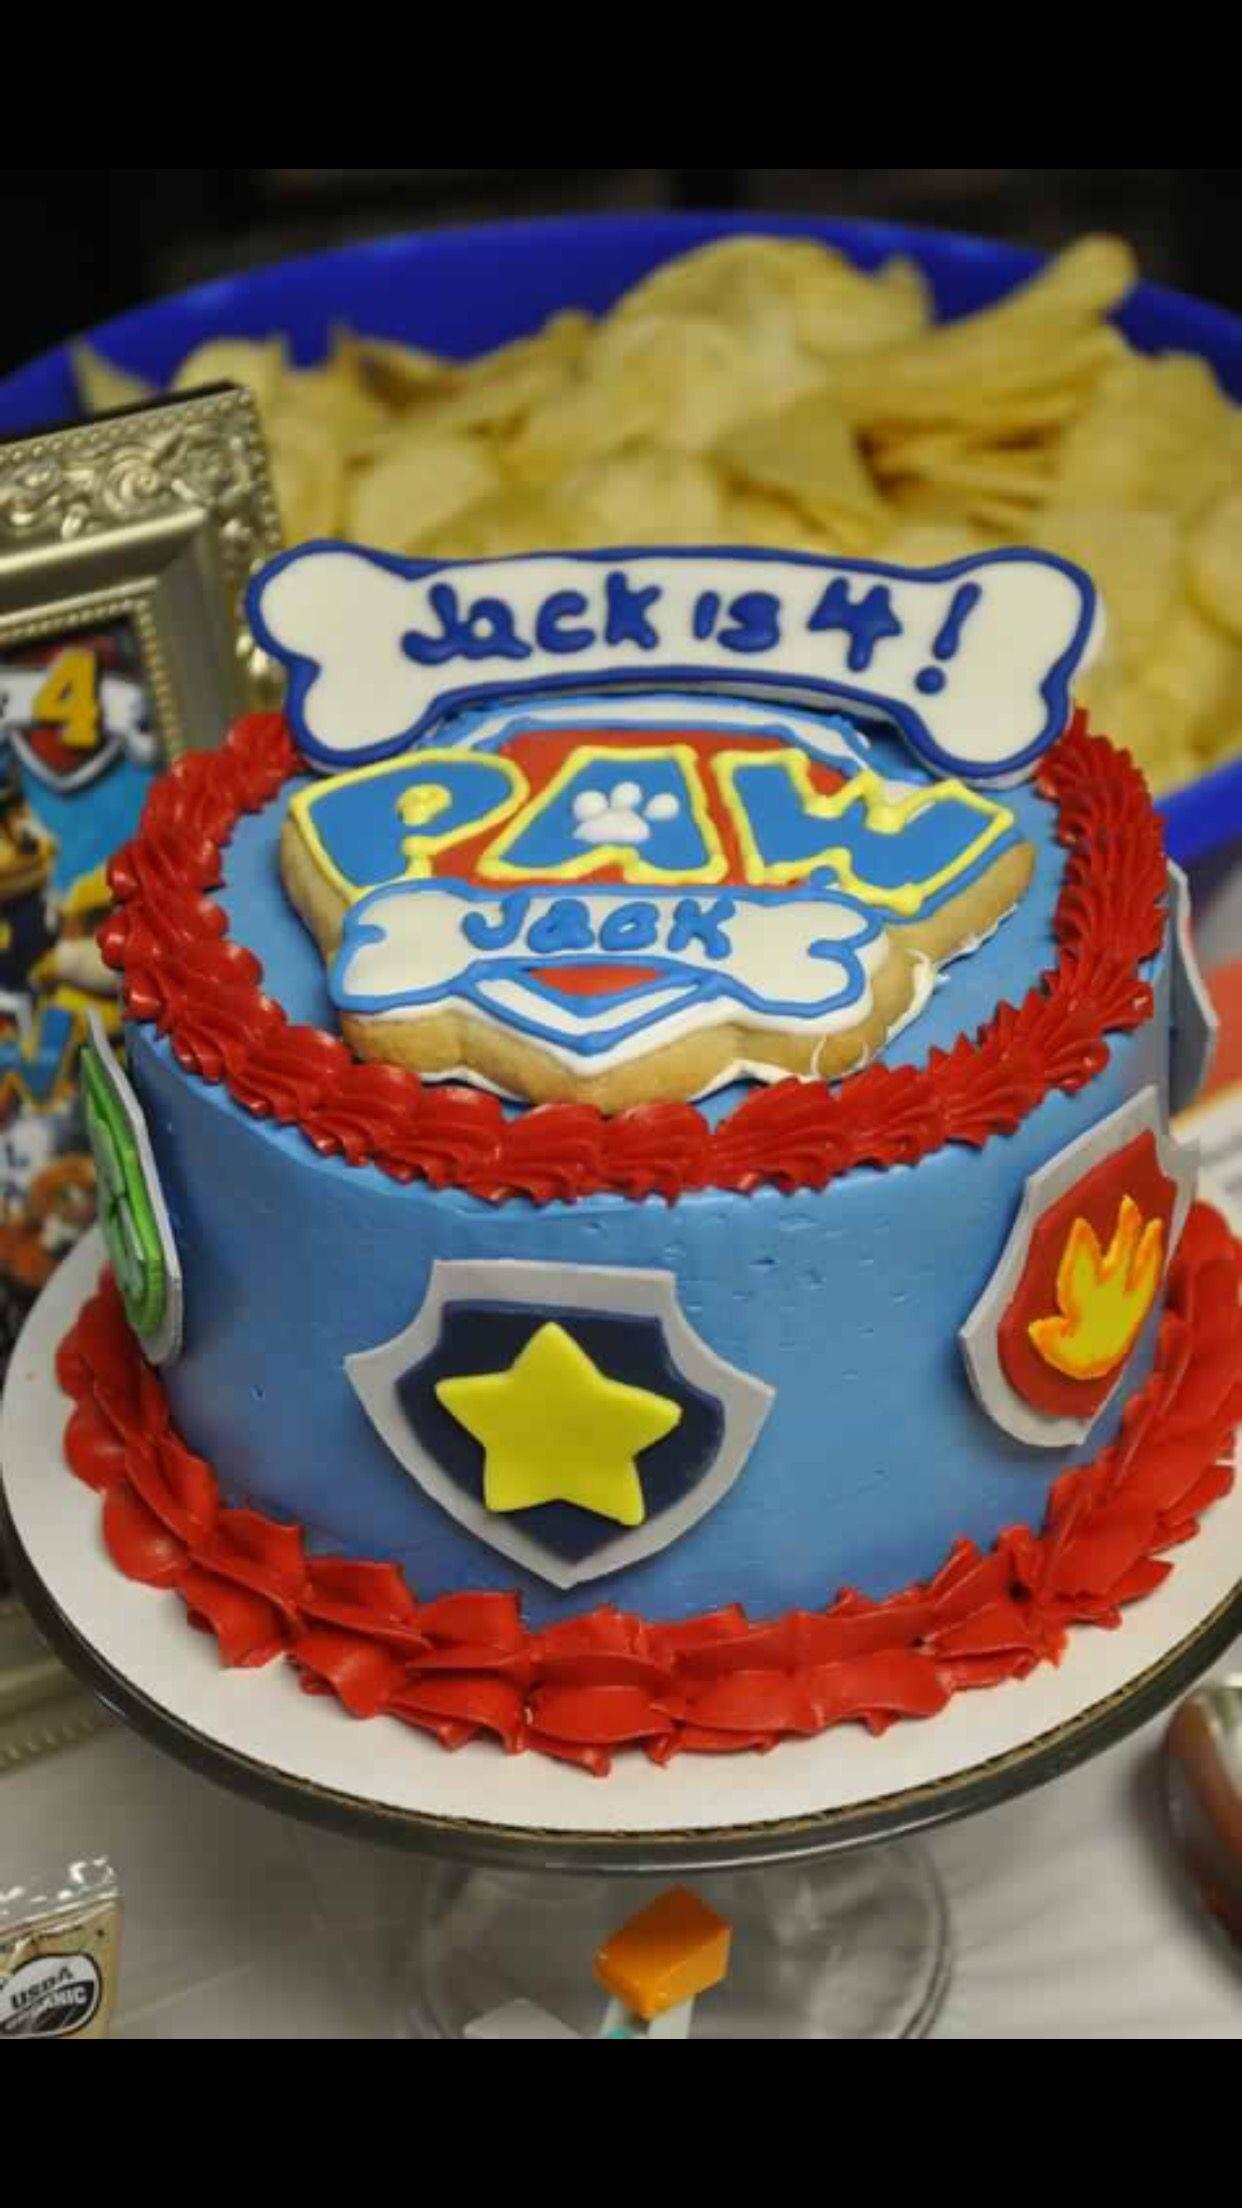 Miraculous Paw Patrol Smash Cake Greenville Sc Www Mysweetfavorites Com Funny Birthday Cards Online Inifodamsfinfo